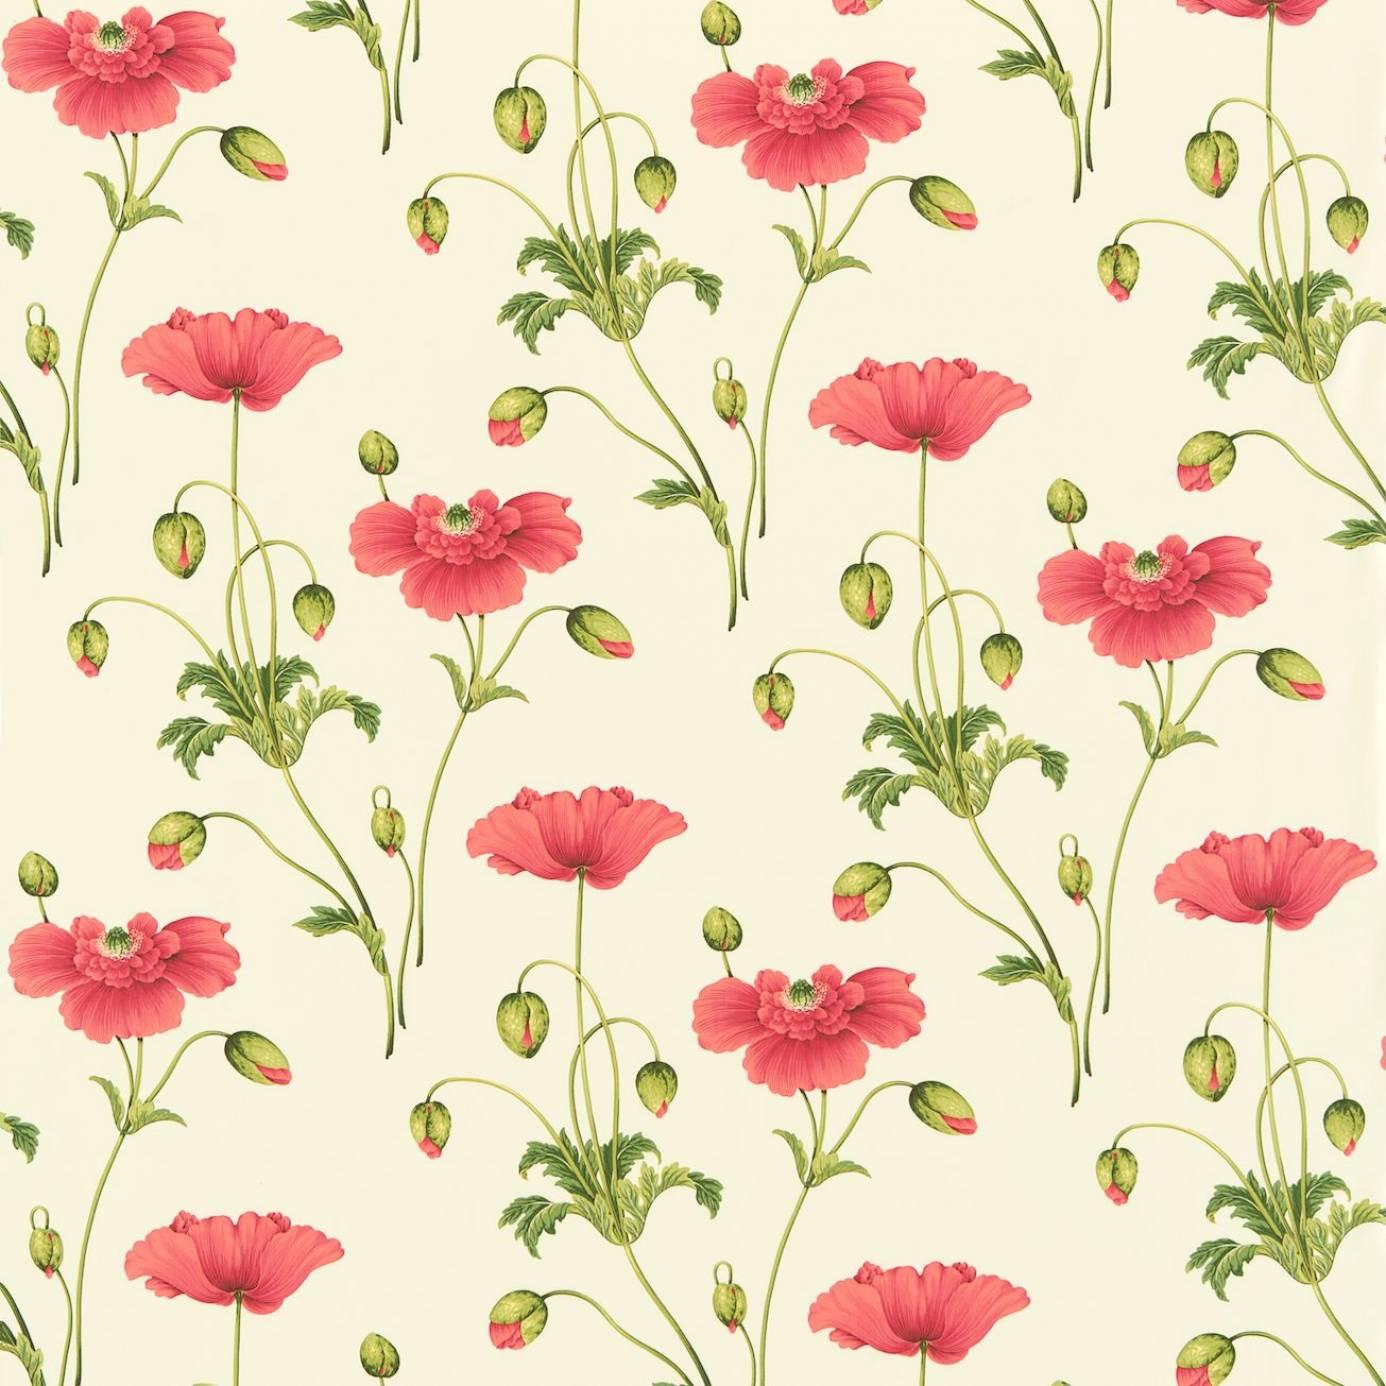 persian poppy fabric red green dpfppp201 sanderson. Black Bedroom Furniture Sets. Home Design Ideas